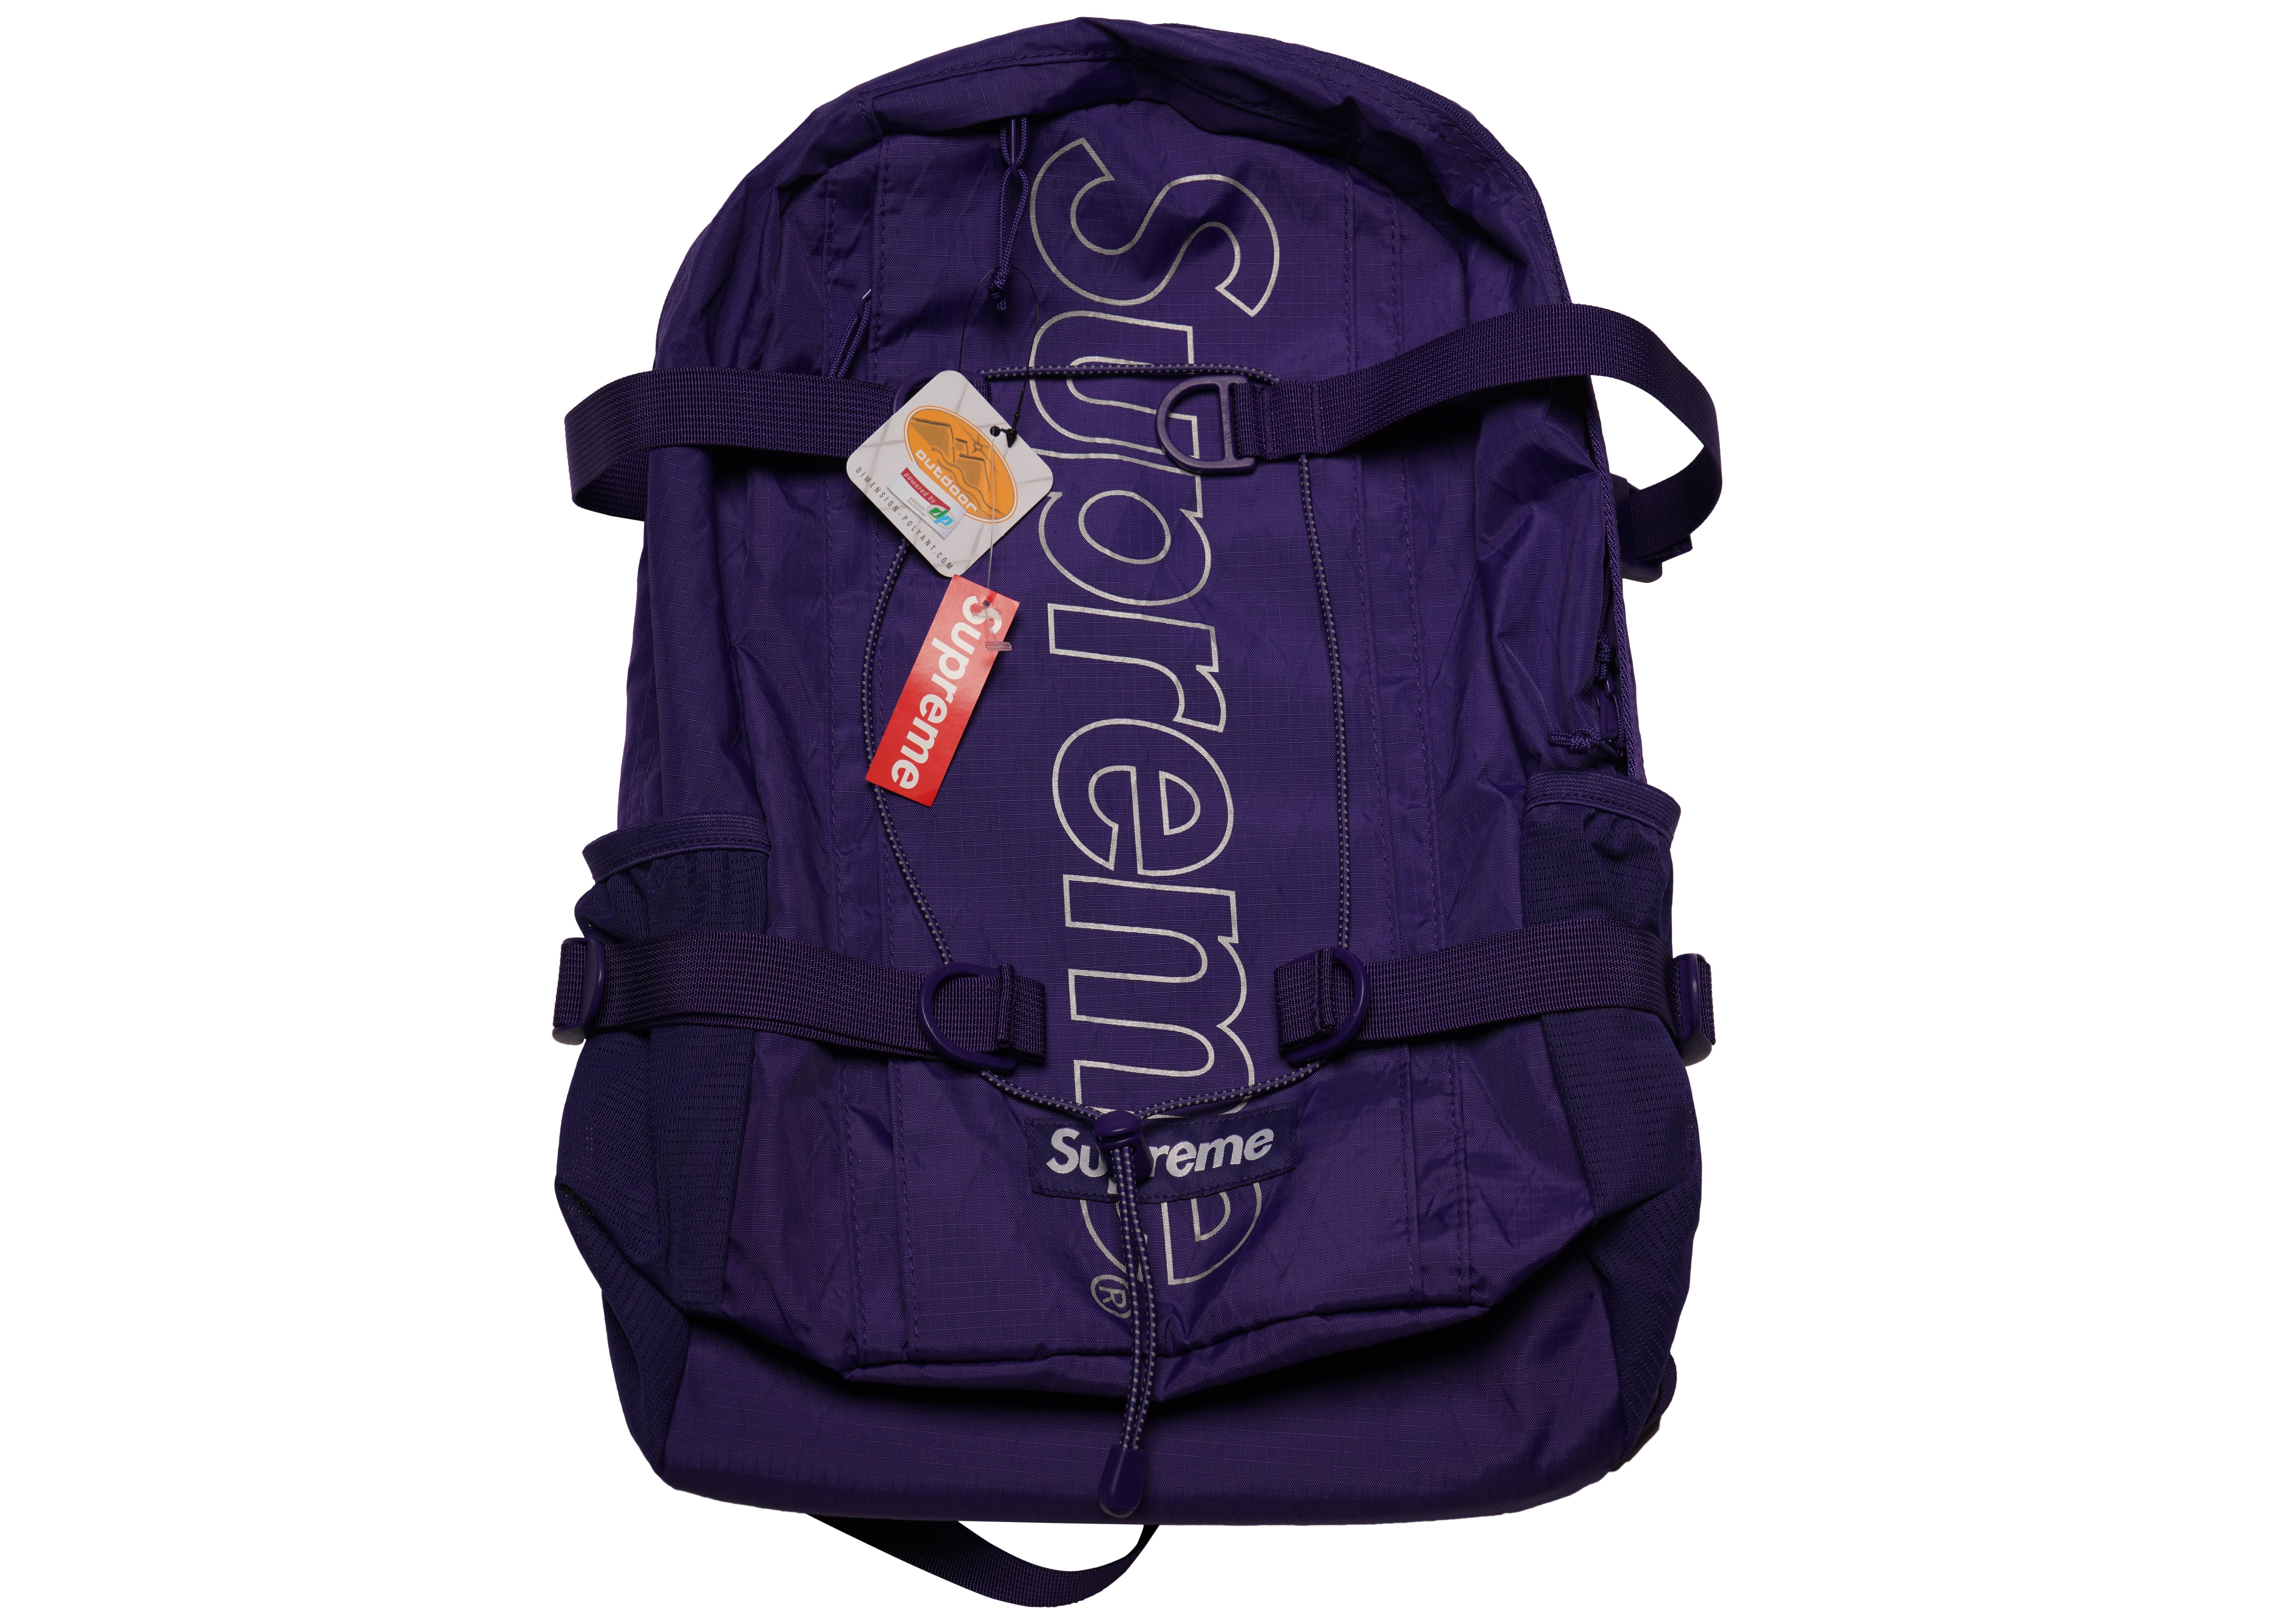 83f86b8d5903 Supreme - Backpack (fw18) Purple for Men - Lyst. View fullscreen